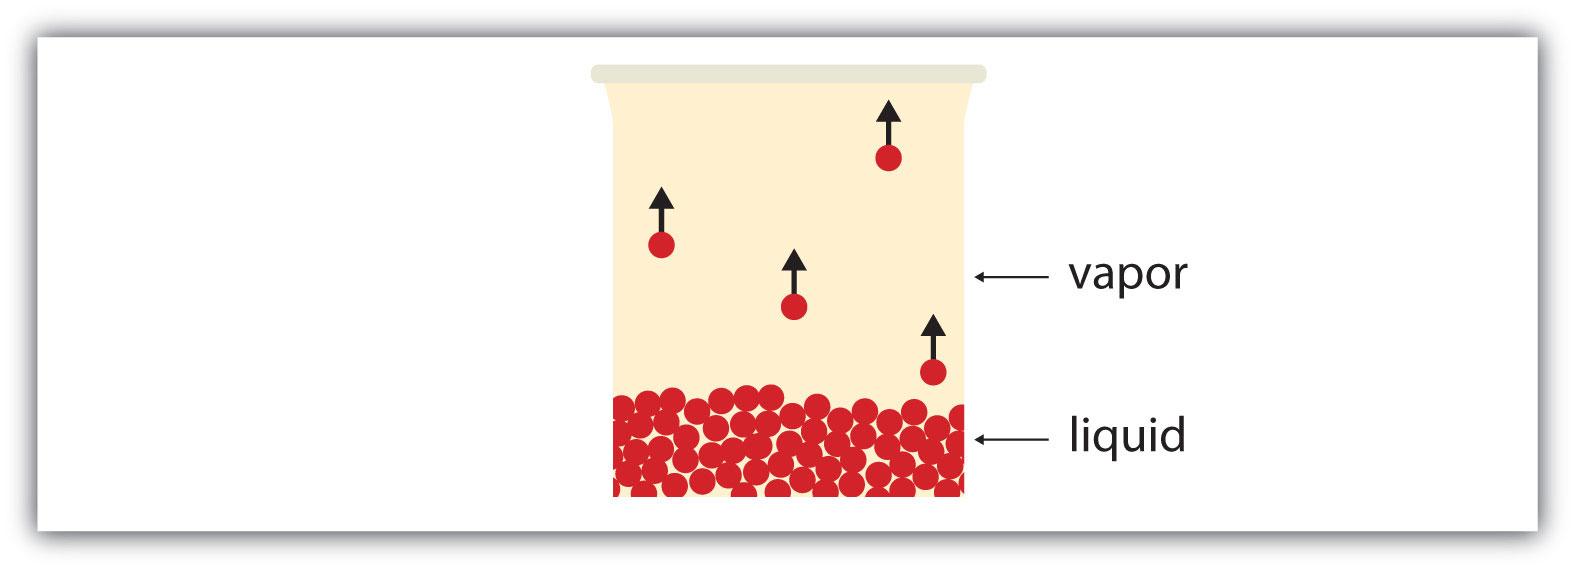 Diagram of the evaporation of a liquid